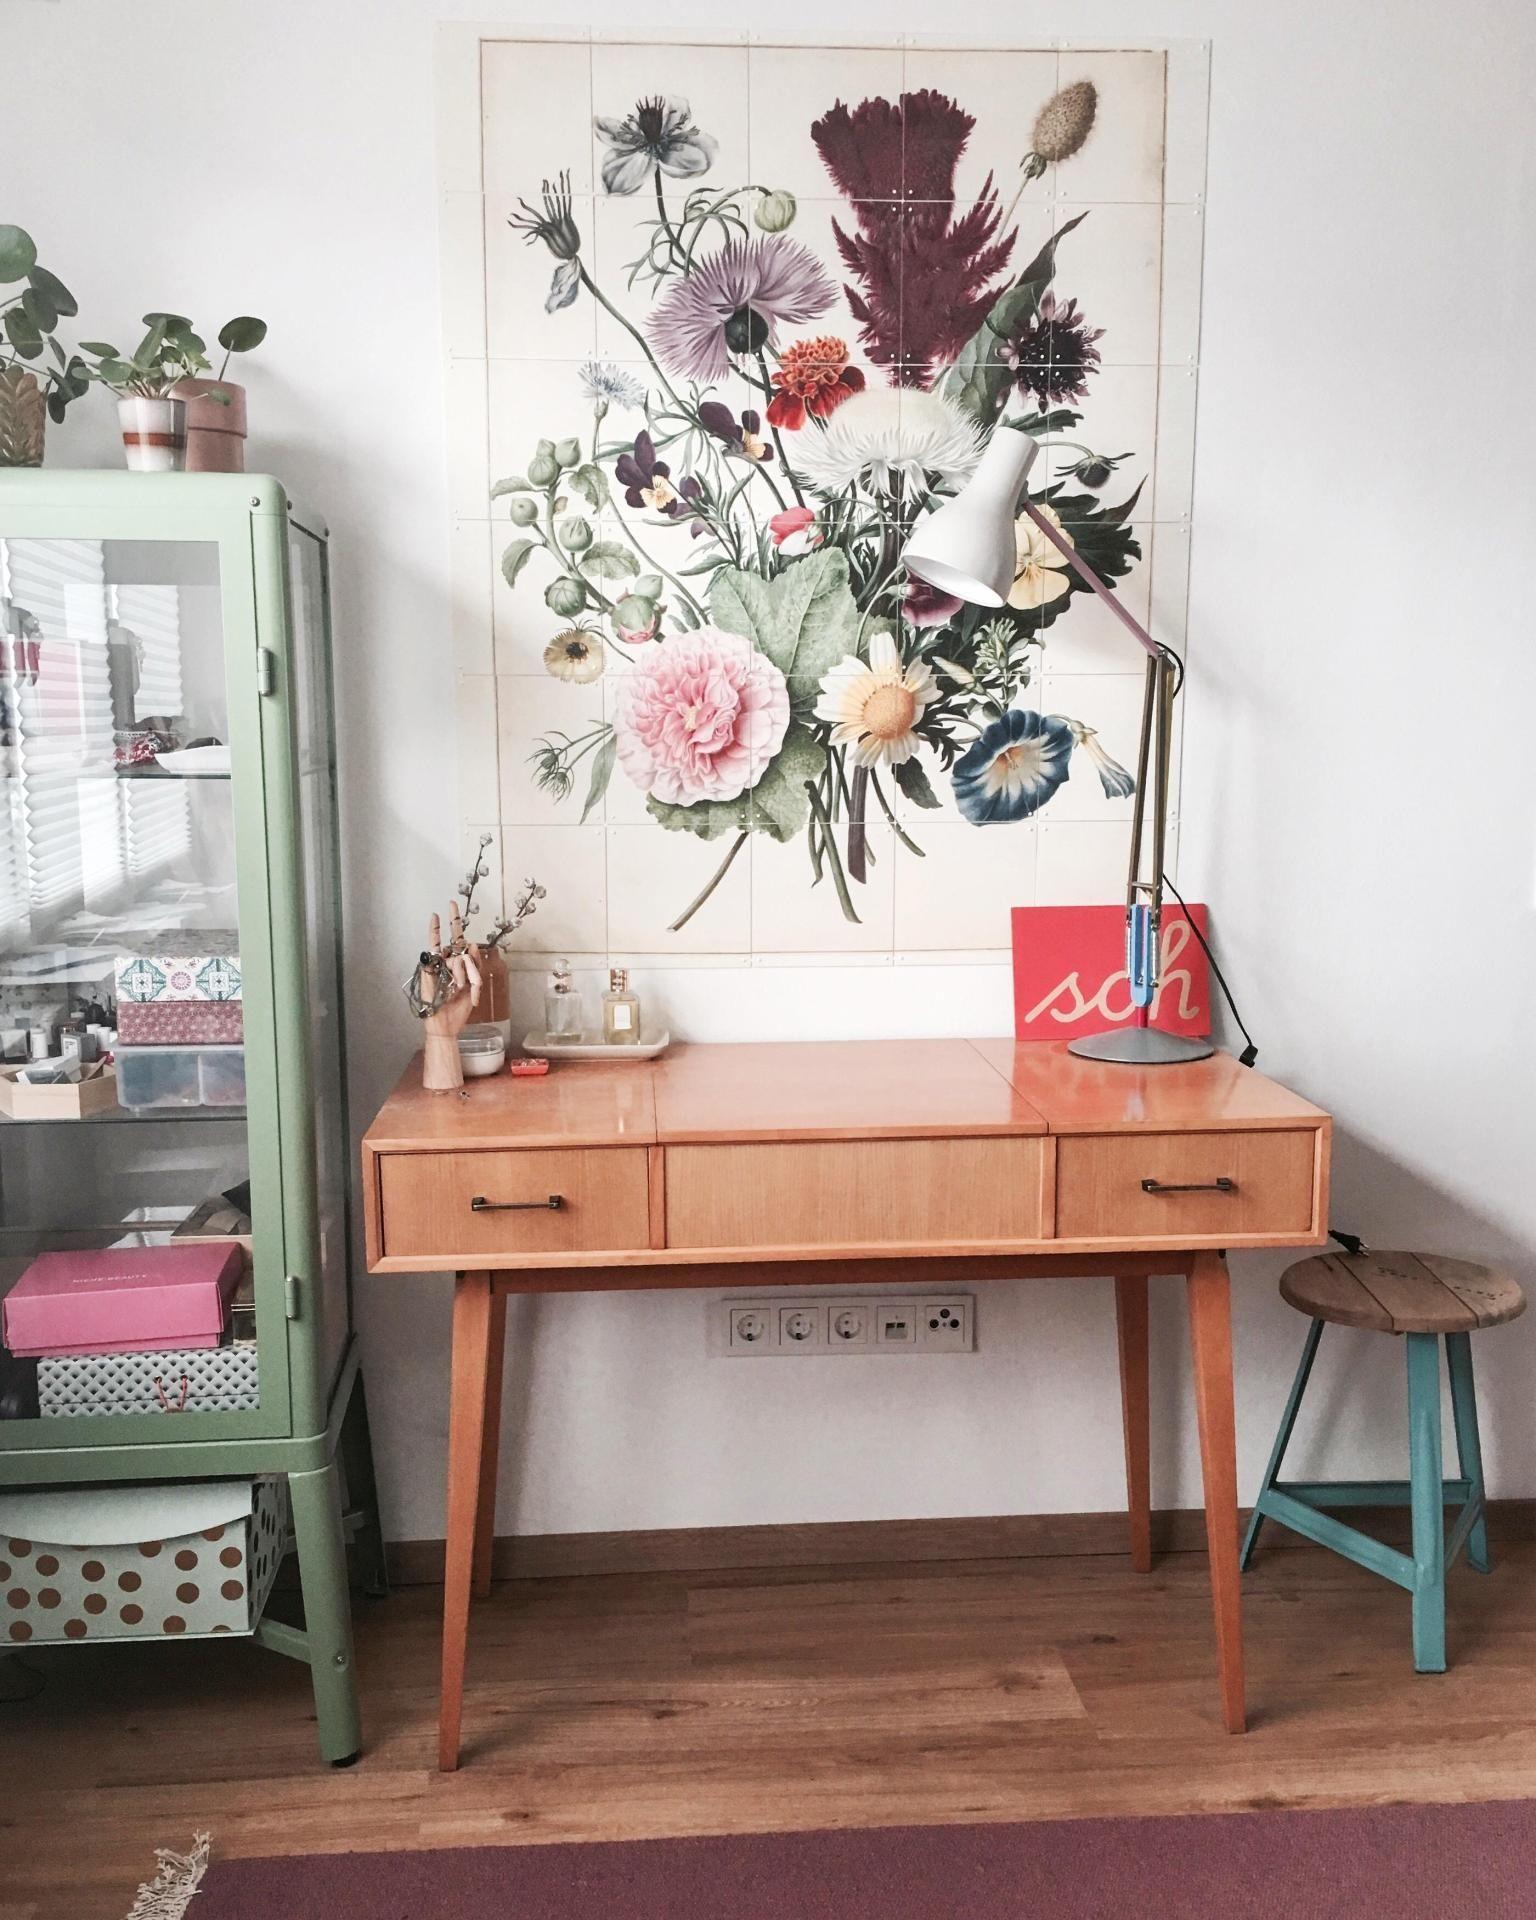 Vintage wohnideen ankleidezimmer  decor ideas  pinterest  home home decor and decor